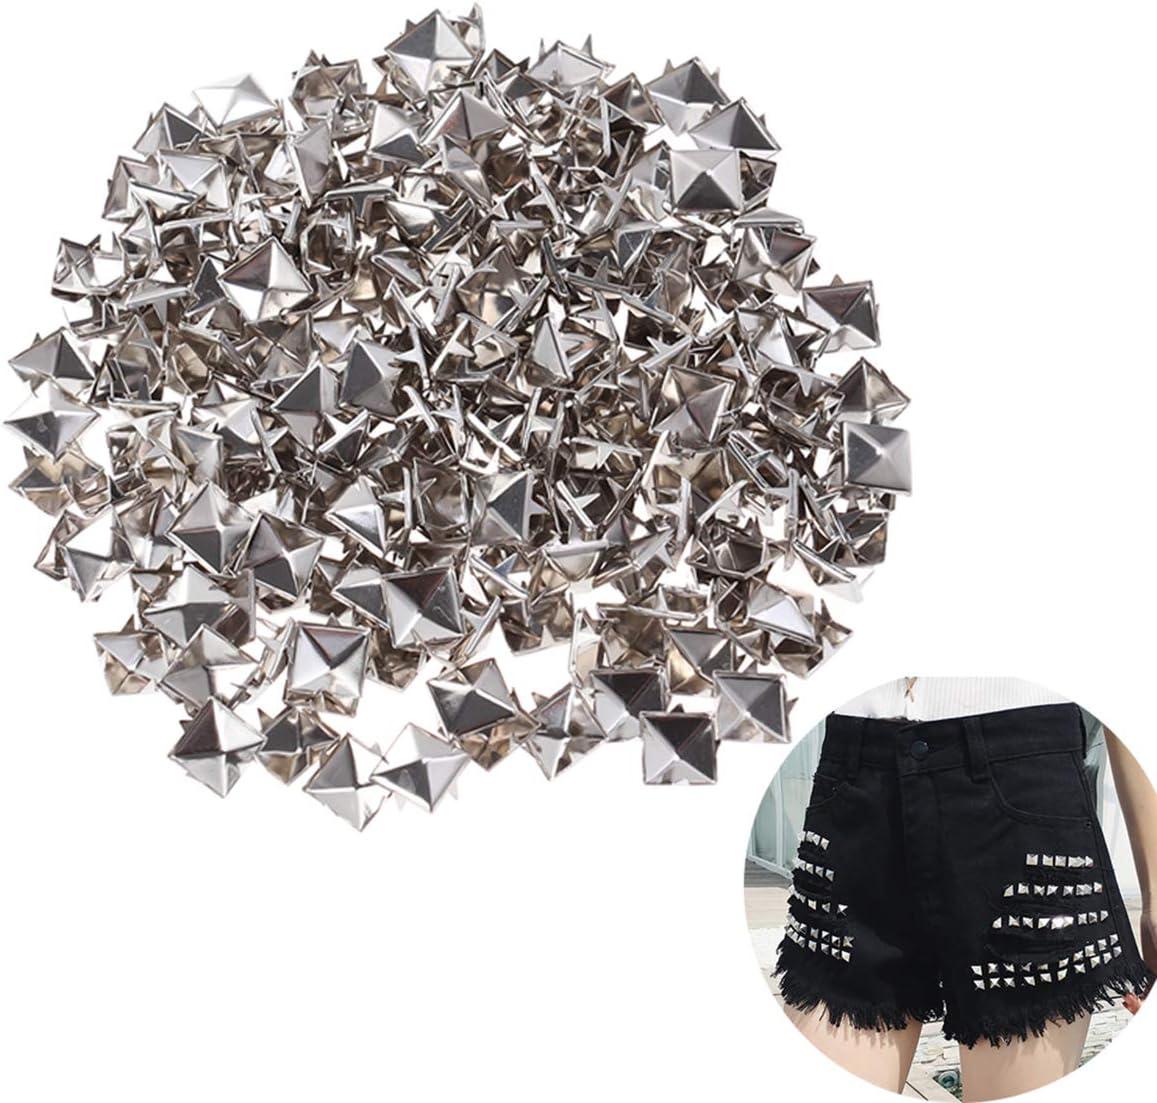 SUPVOX 200pcs Remaches Punk Cuadros Acero Goujon Puntas Clavo para DIY Zapatos Cintur/ón Ropa decoraci/ón Plata